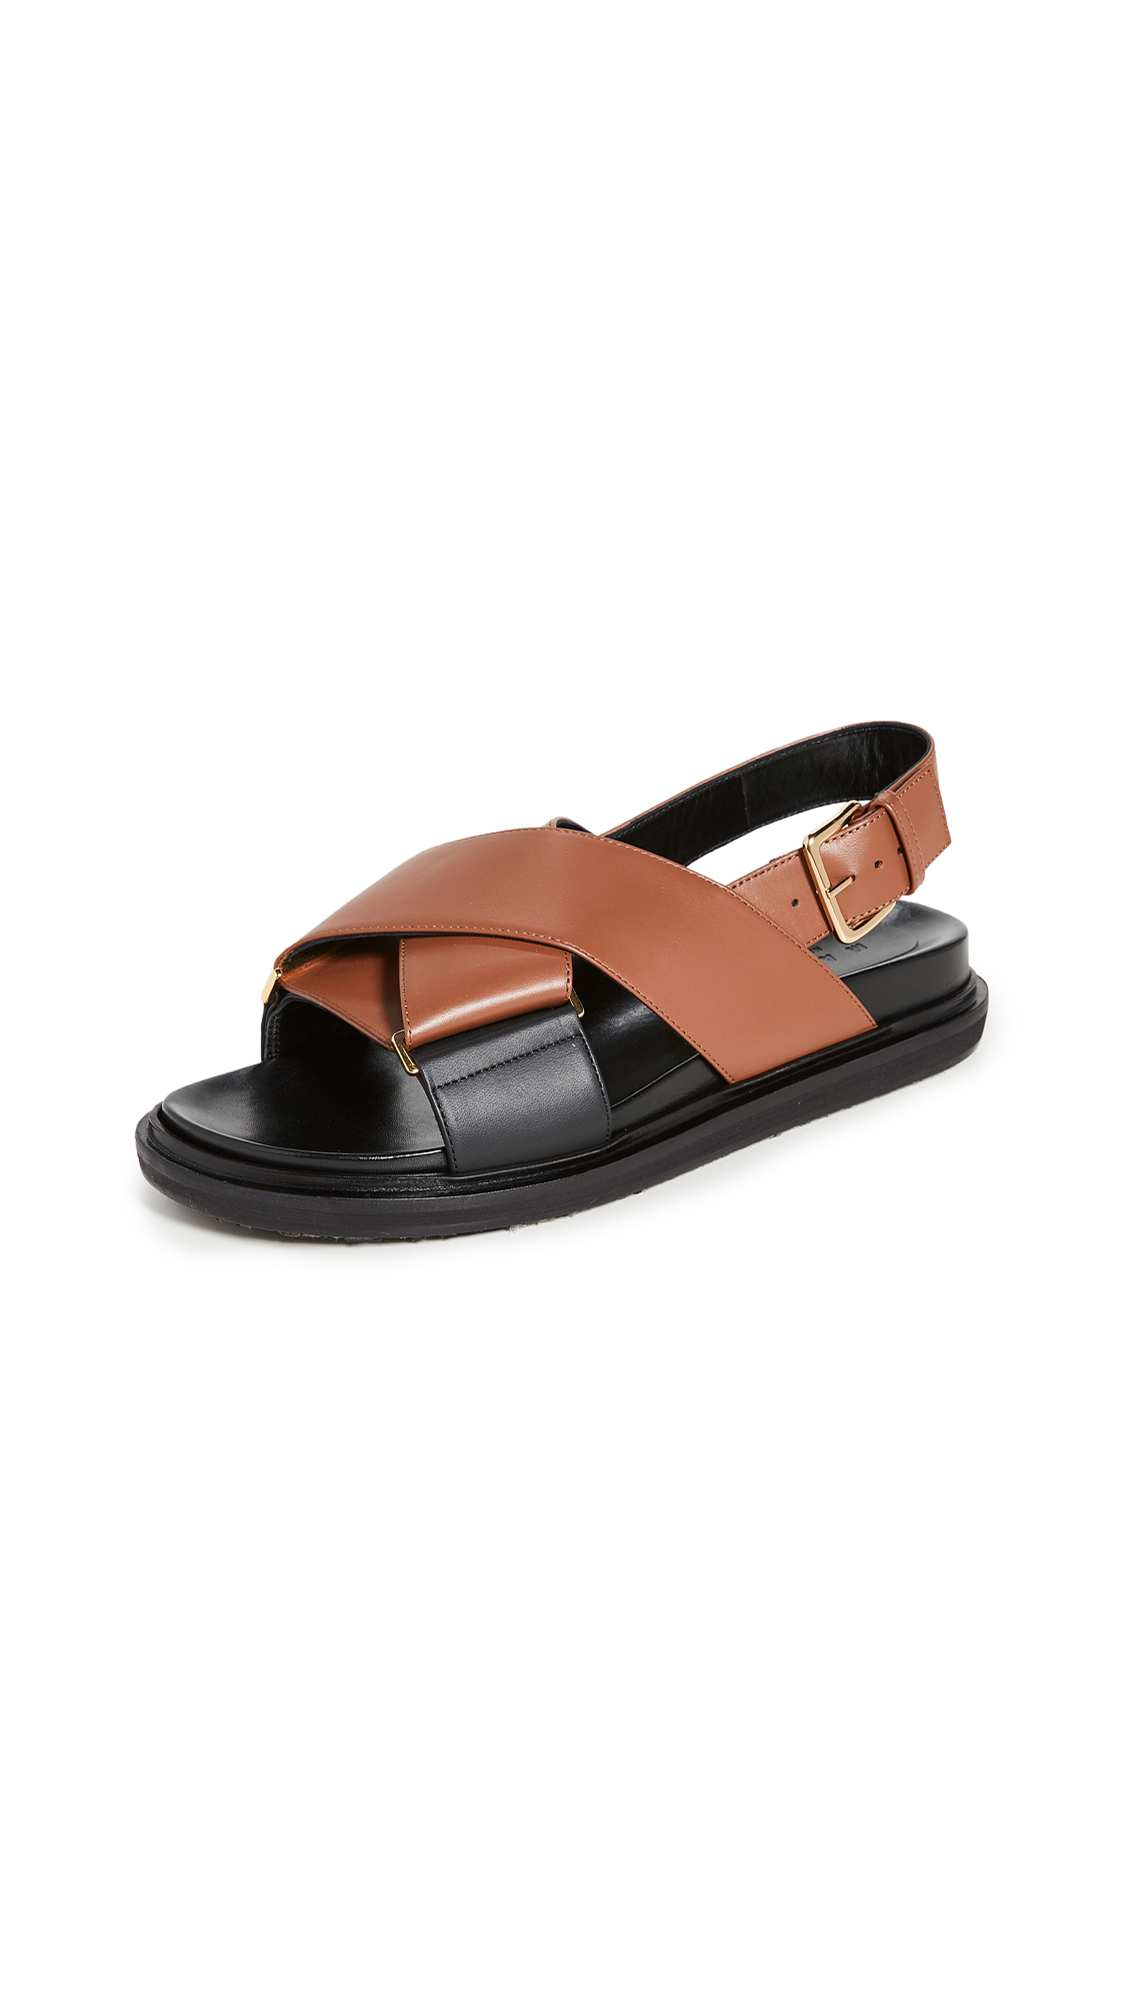 Buy Marni Crisscross Fussbett Sandals online, shop Marni